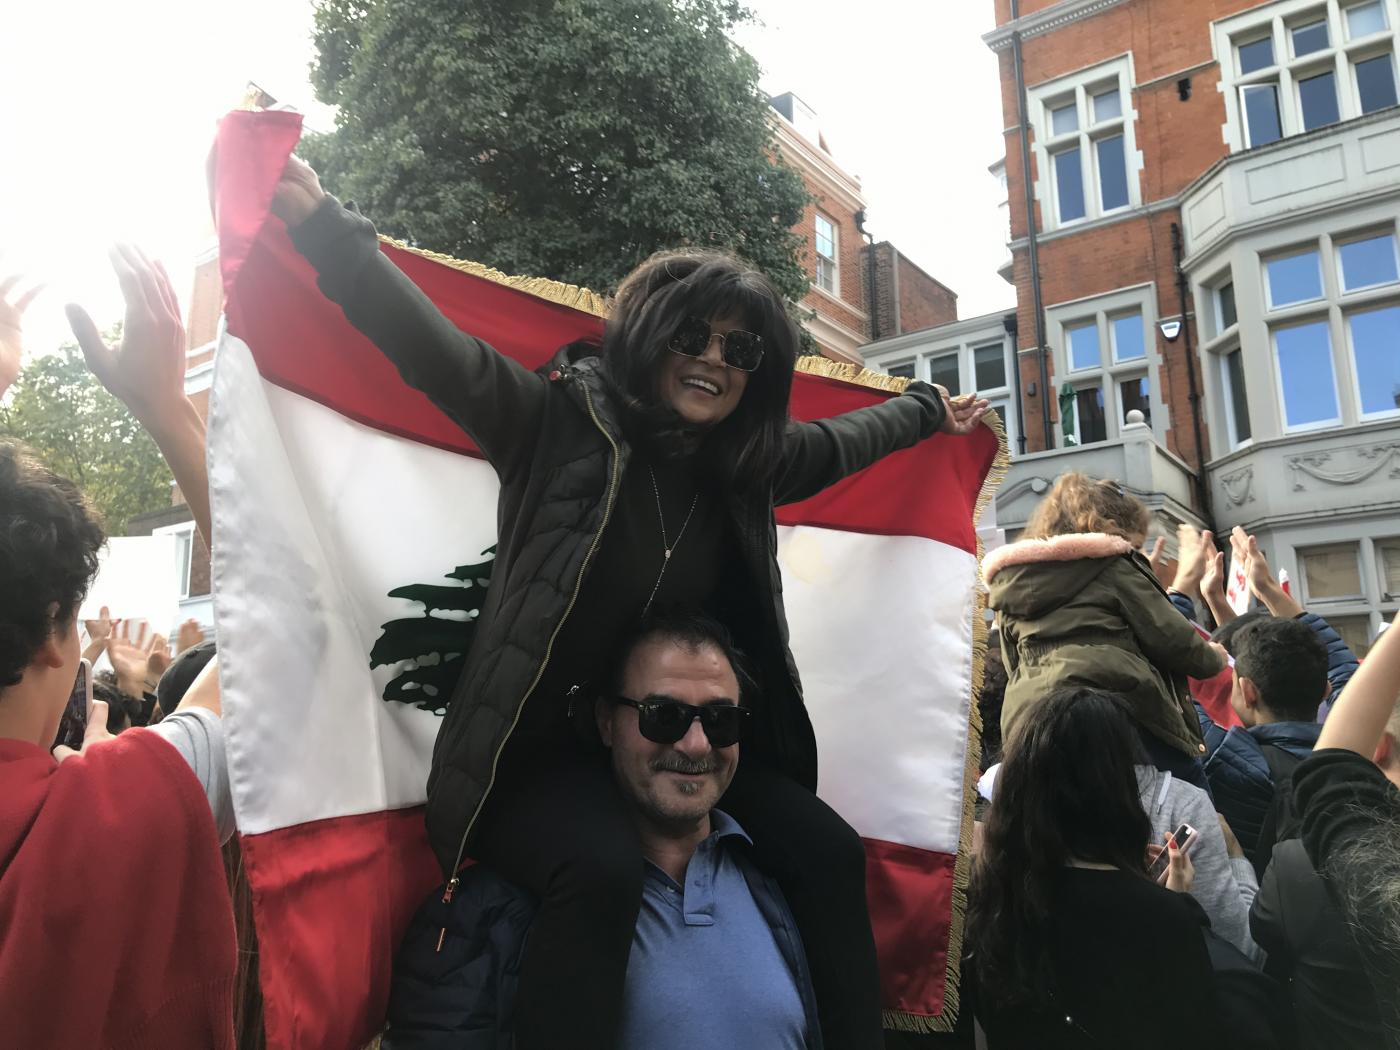 libanese dating Londra compilazione di moduli di dating online